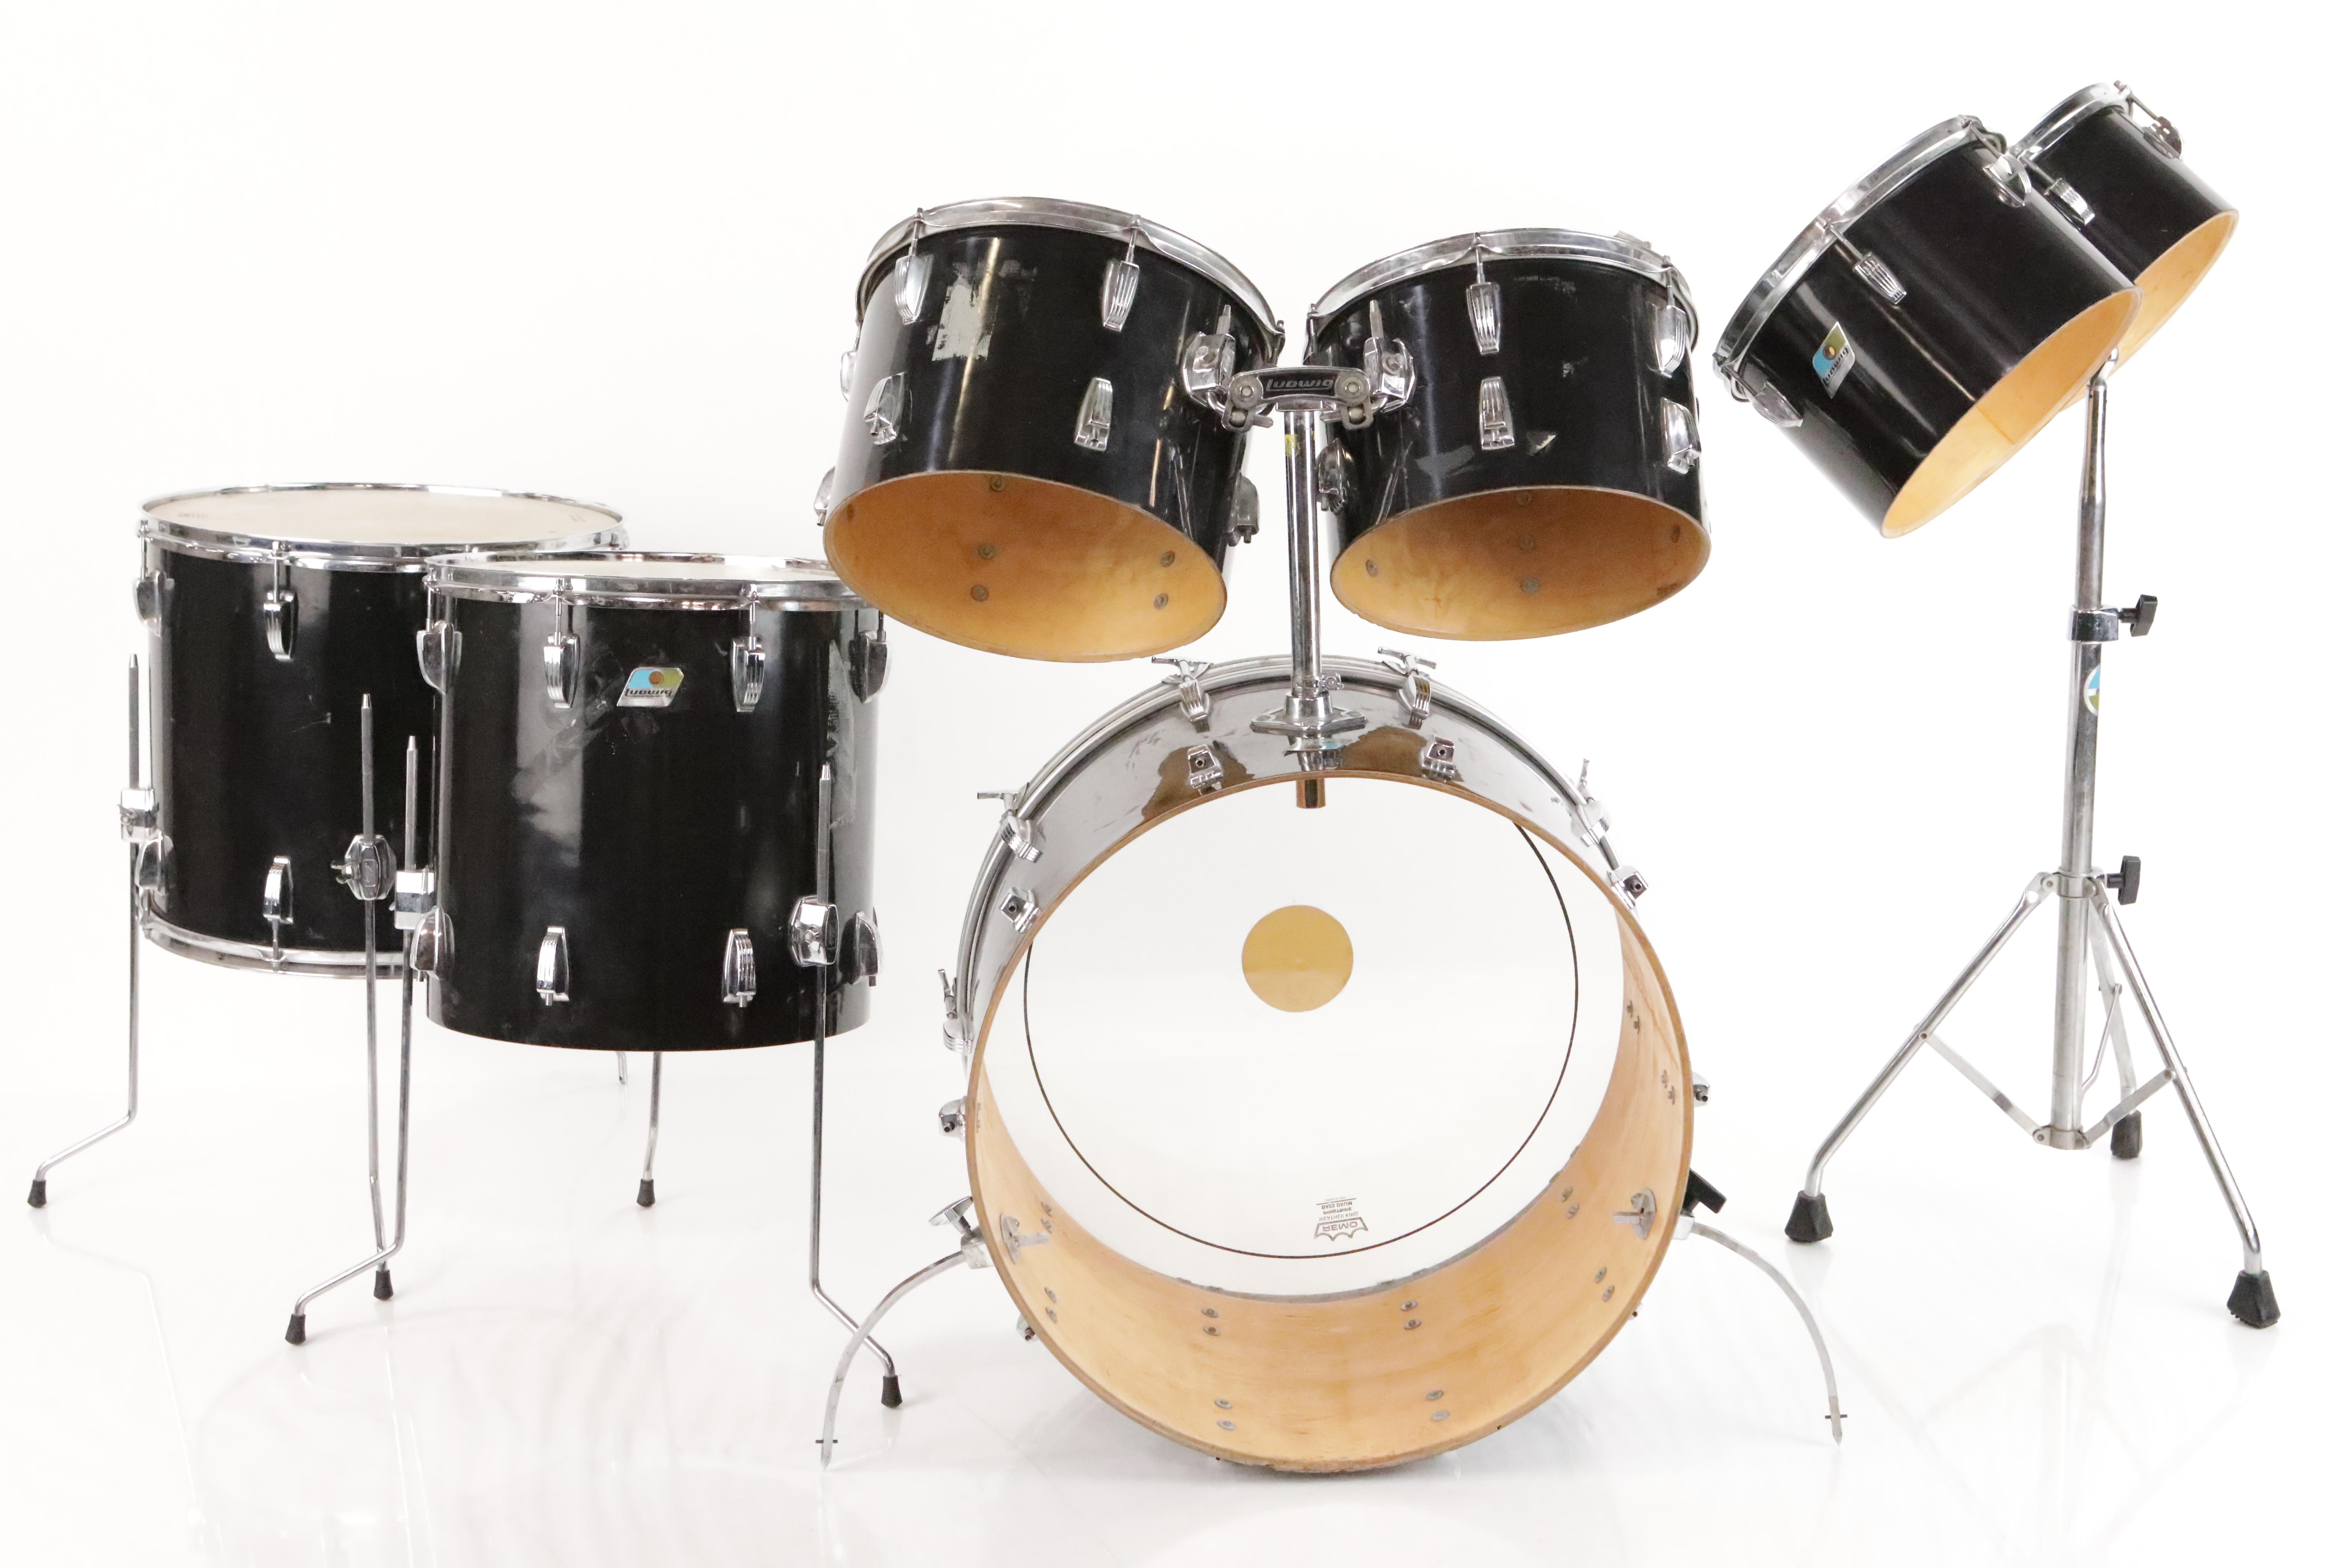 1979 Ludwig 7-Piece Black Cortex Drum Set Kit w/ Extras Leather Stick Bag #35151